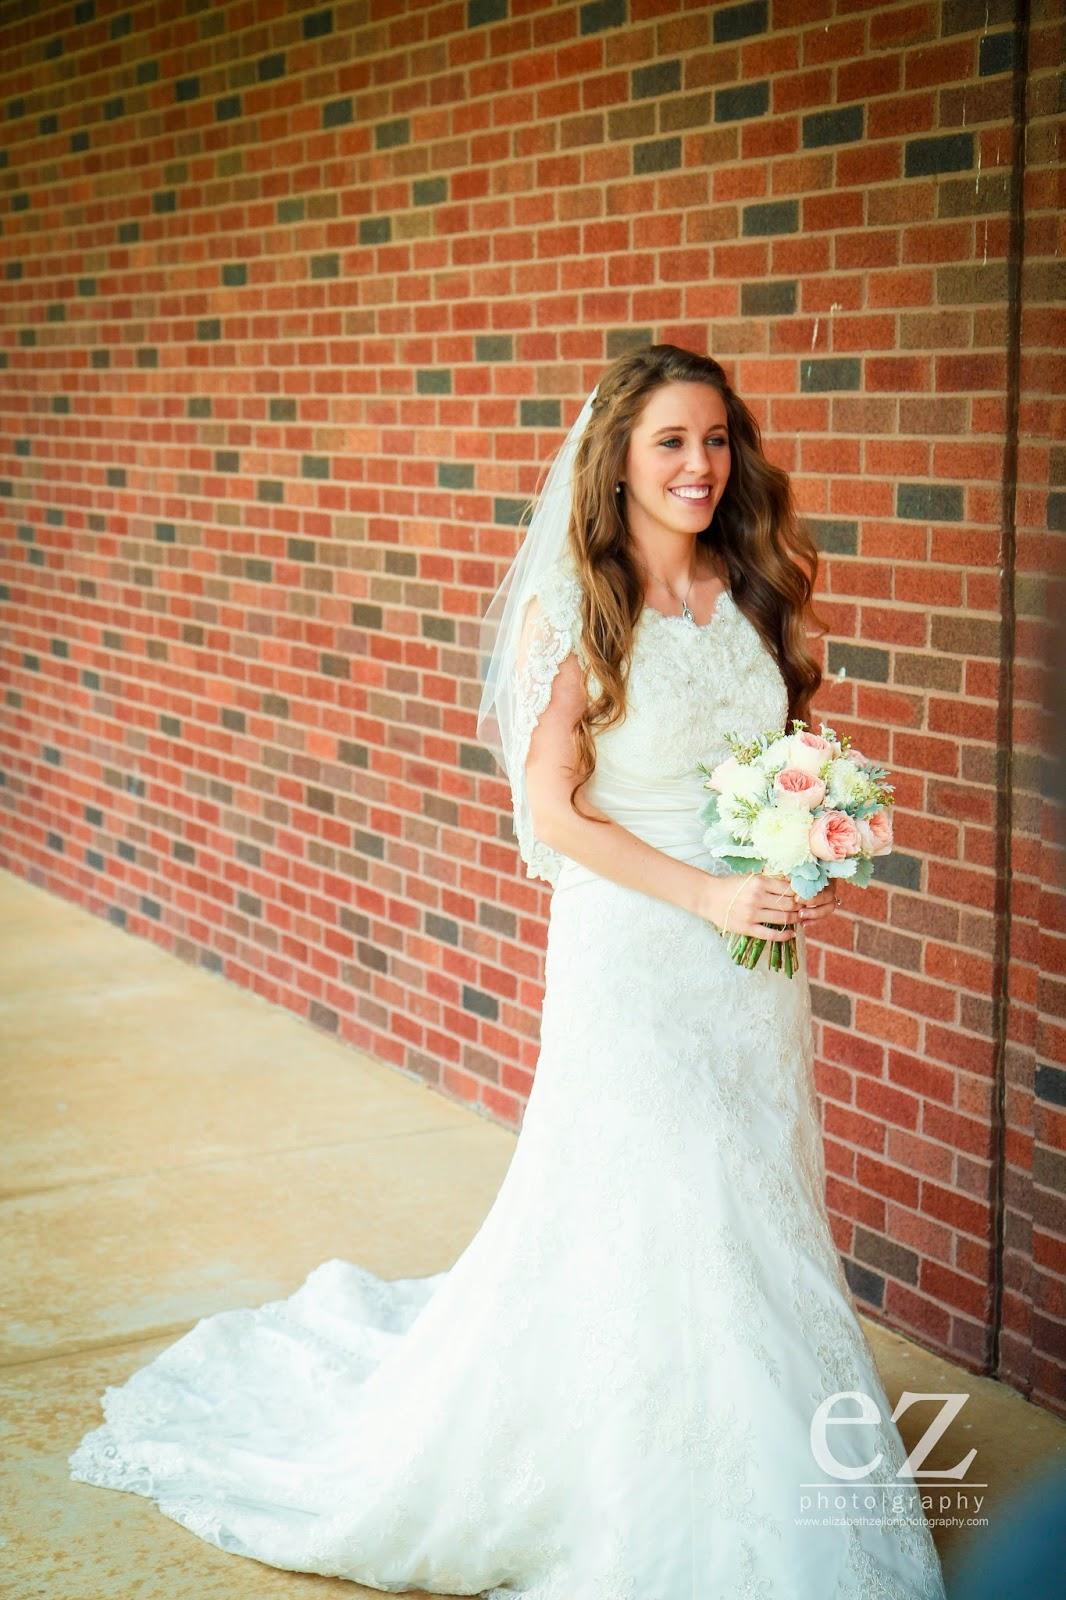 photos dillards first look and wedding dillards wedding dress Photos Elizabeth Zellon Photography